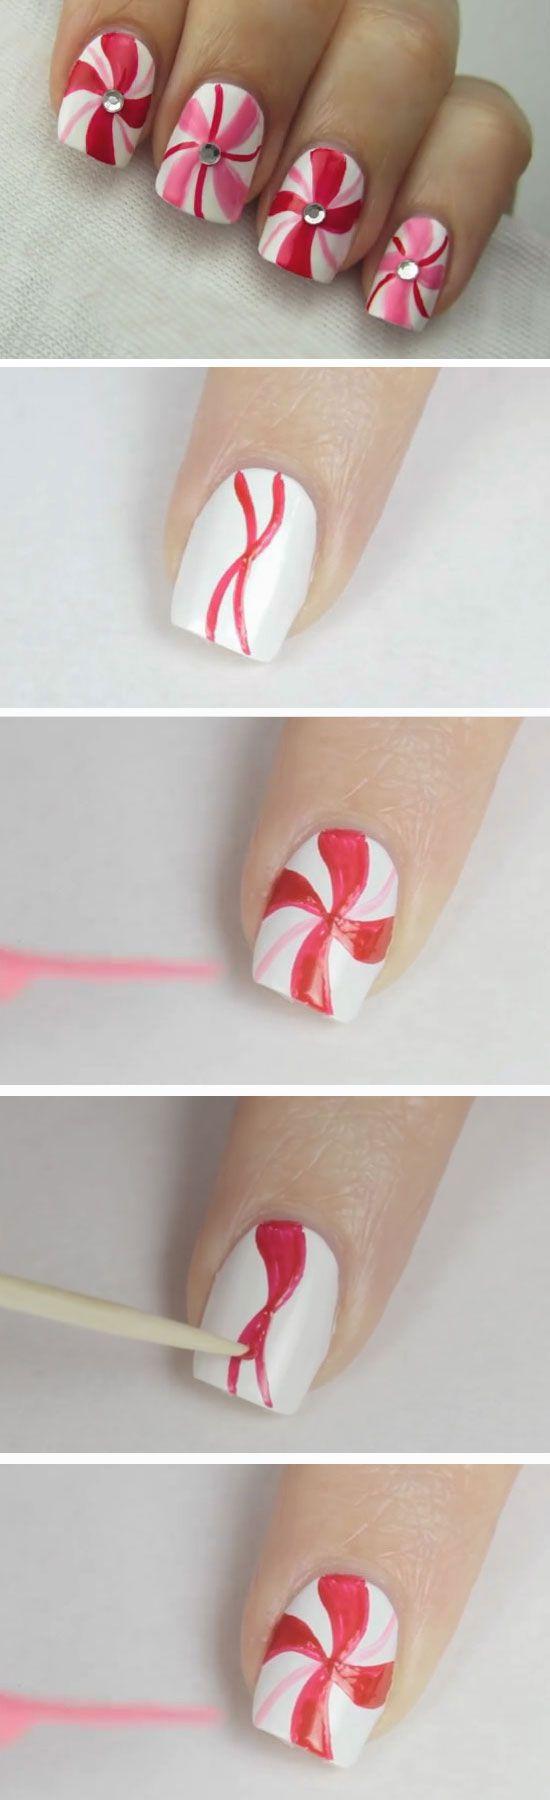 swirl nail art ideas